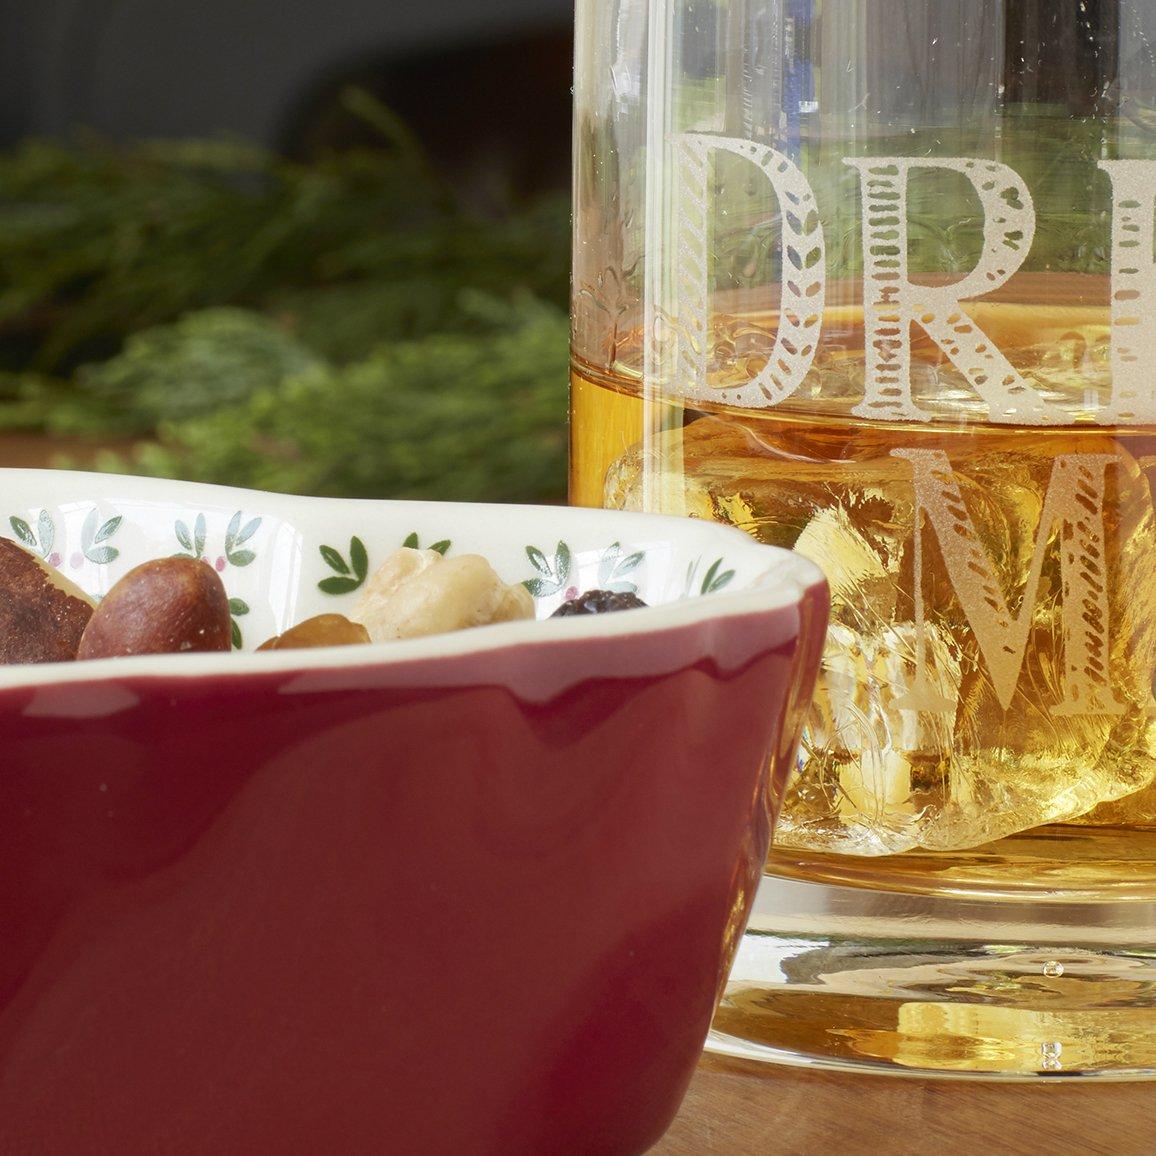 36.5 fl oz 1 L Creative Tops Stir It Up /'Drink Up/' Glass Water Wine Carafe